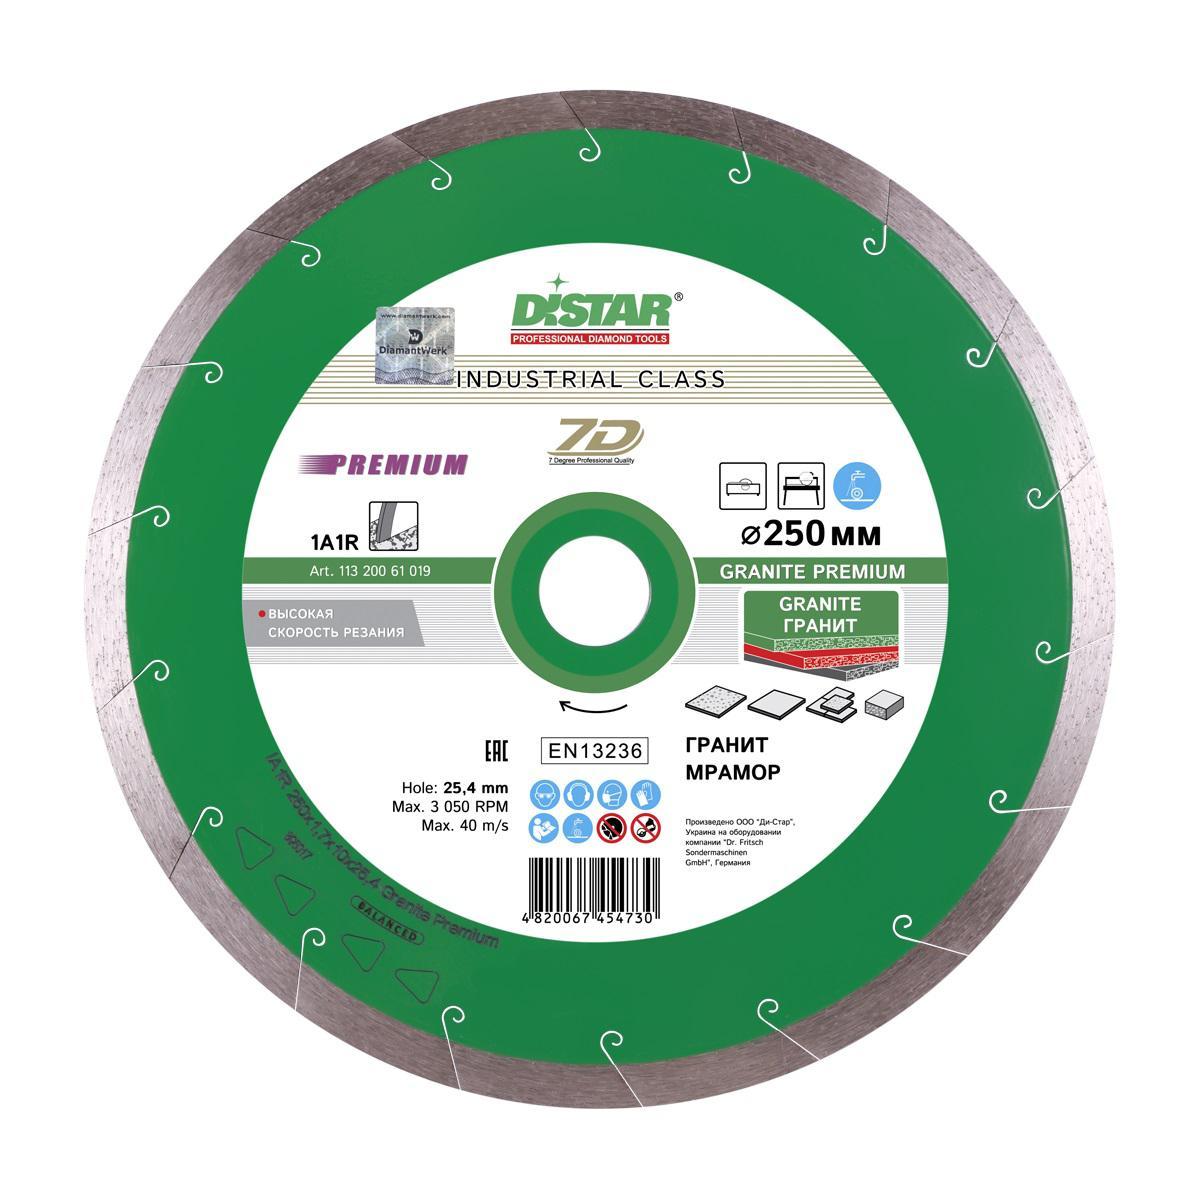 Круг алмазный Di-star 1a1r 250x1,7x10x25,4 granite premium диск алмазный турбо 200x25 4 di star